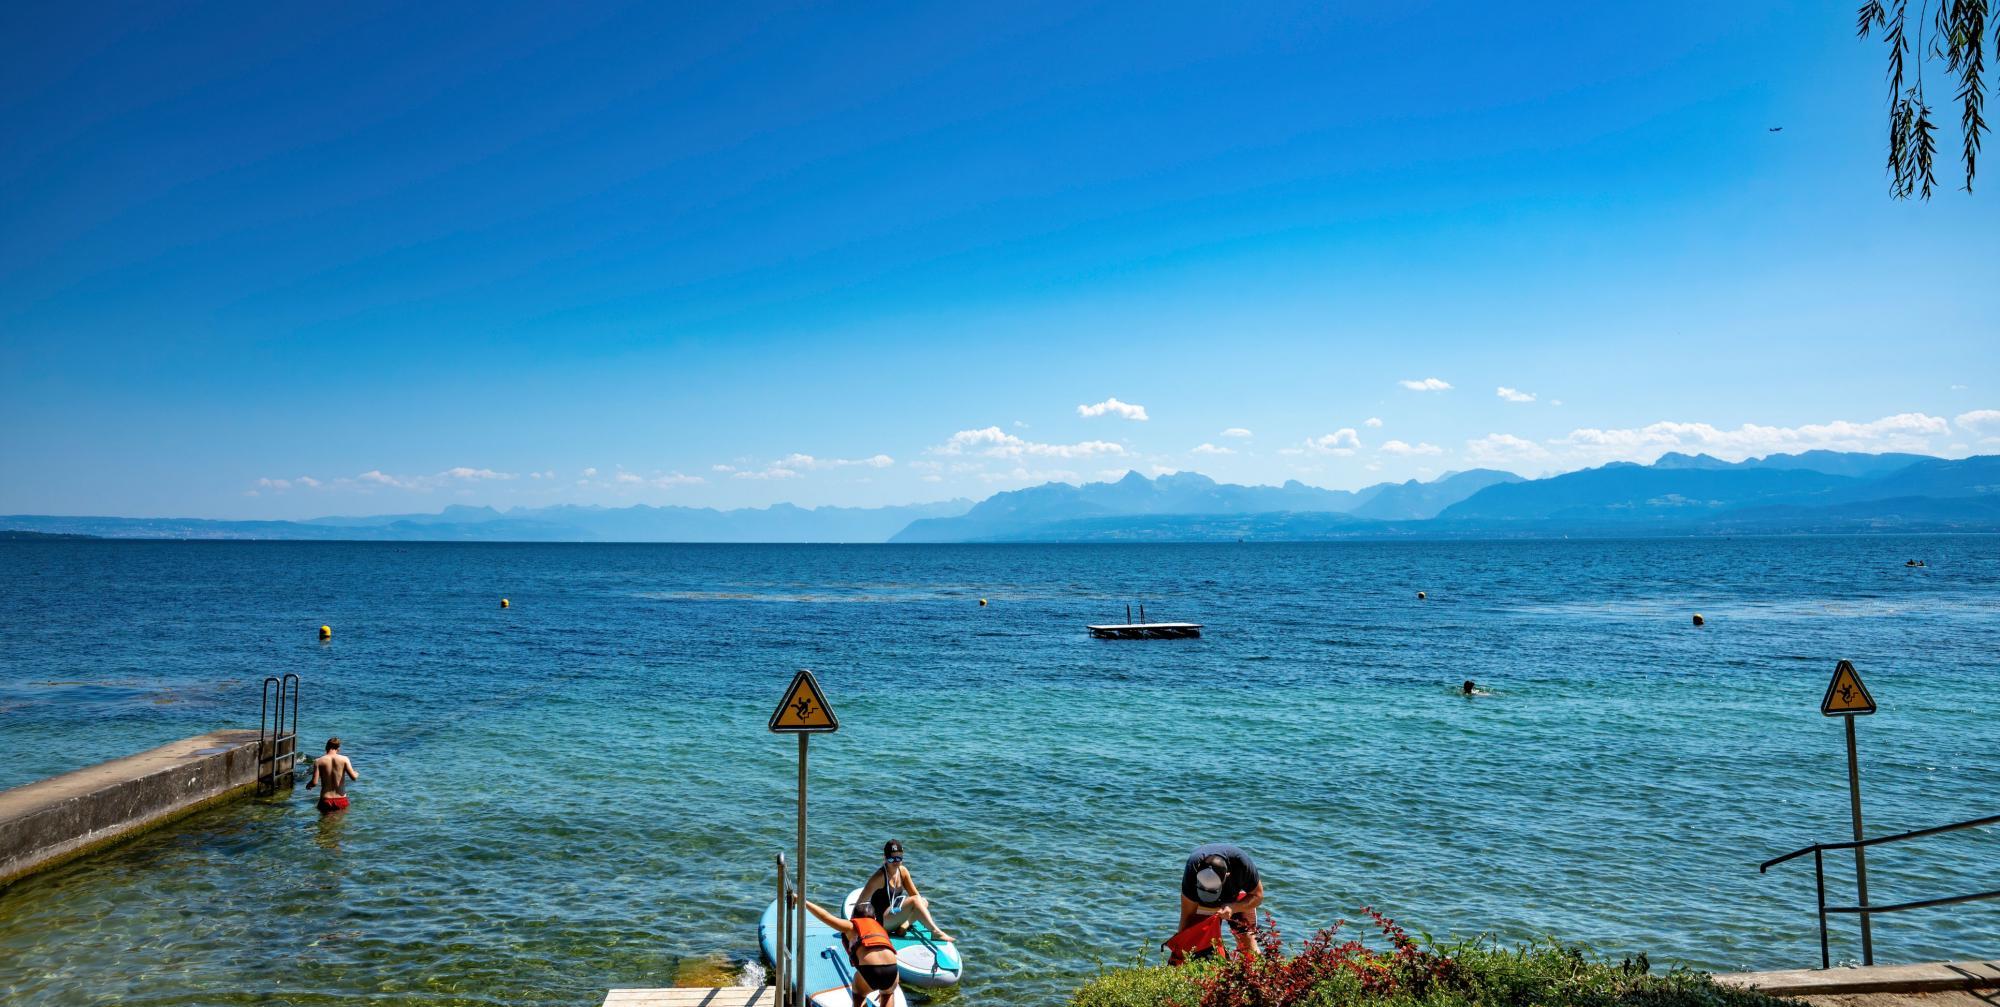 Entspannt am See statt gestresst am Meer